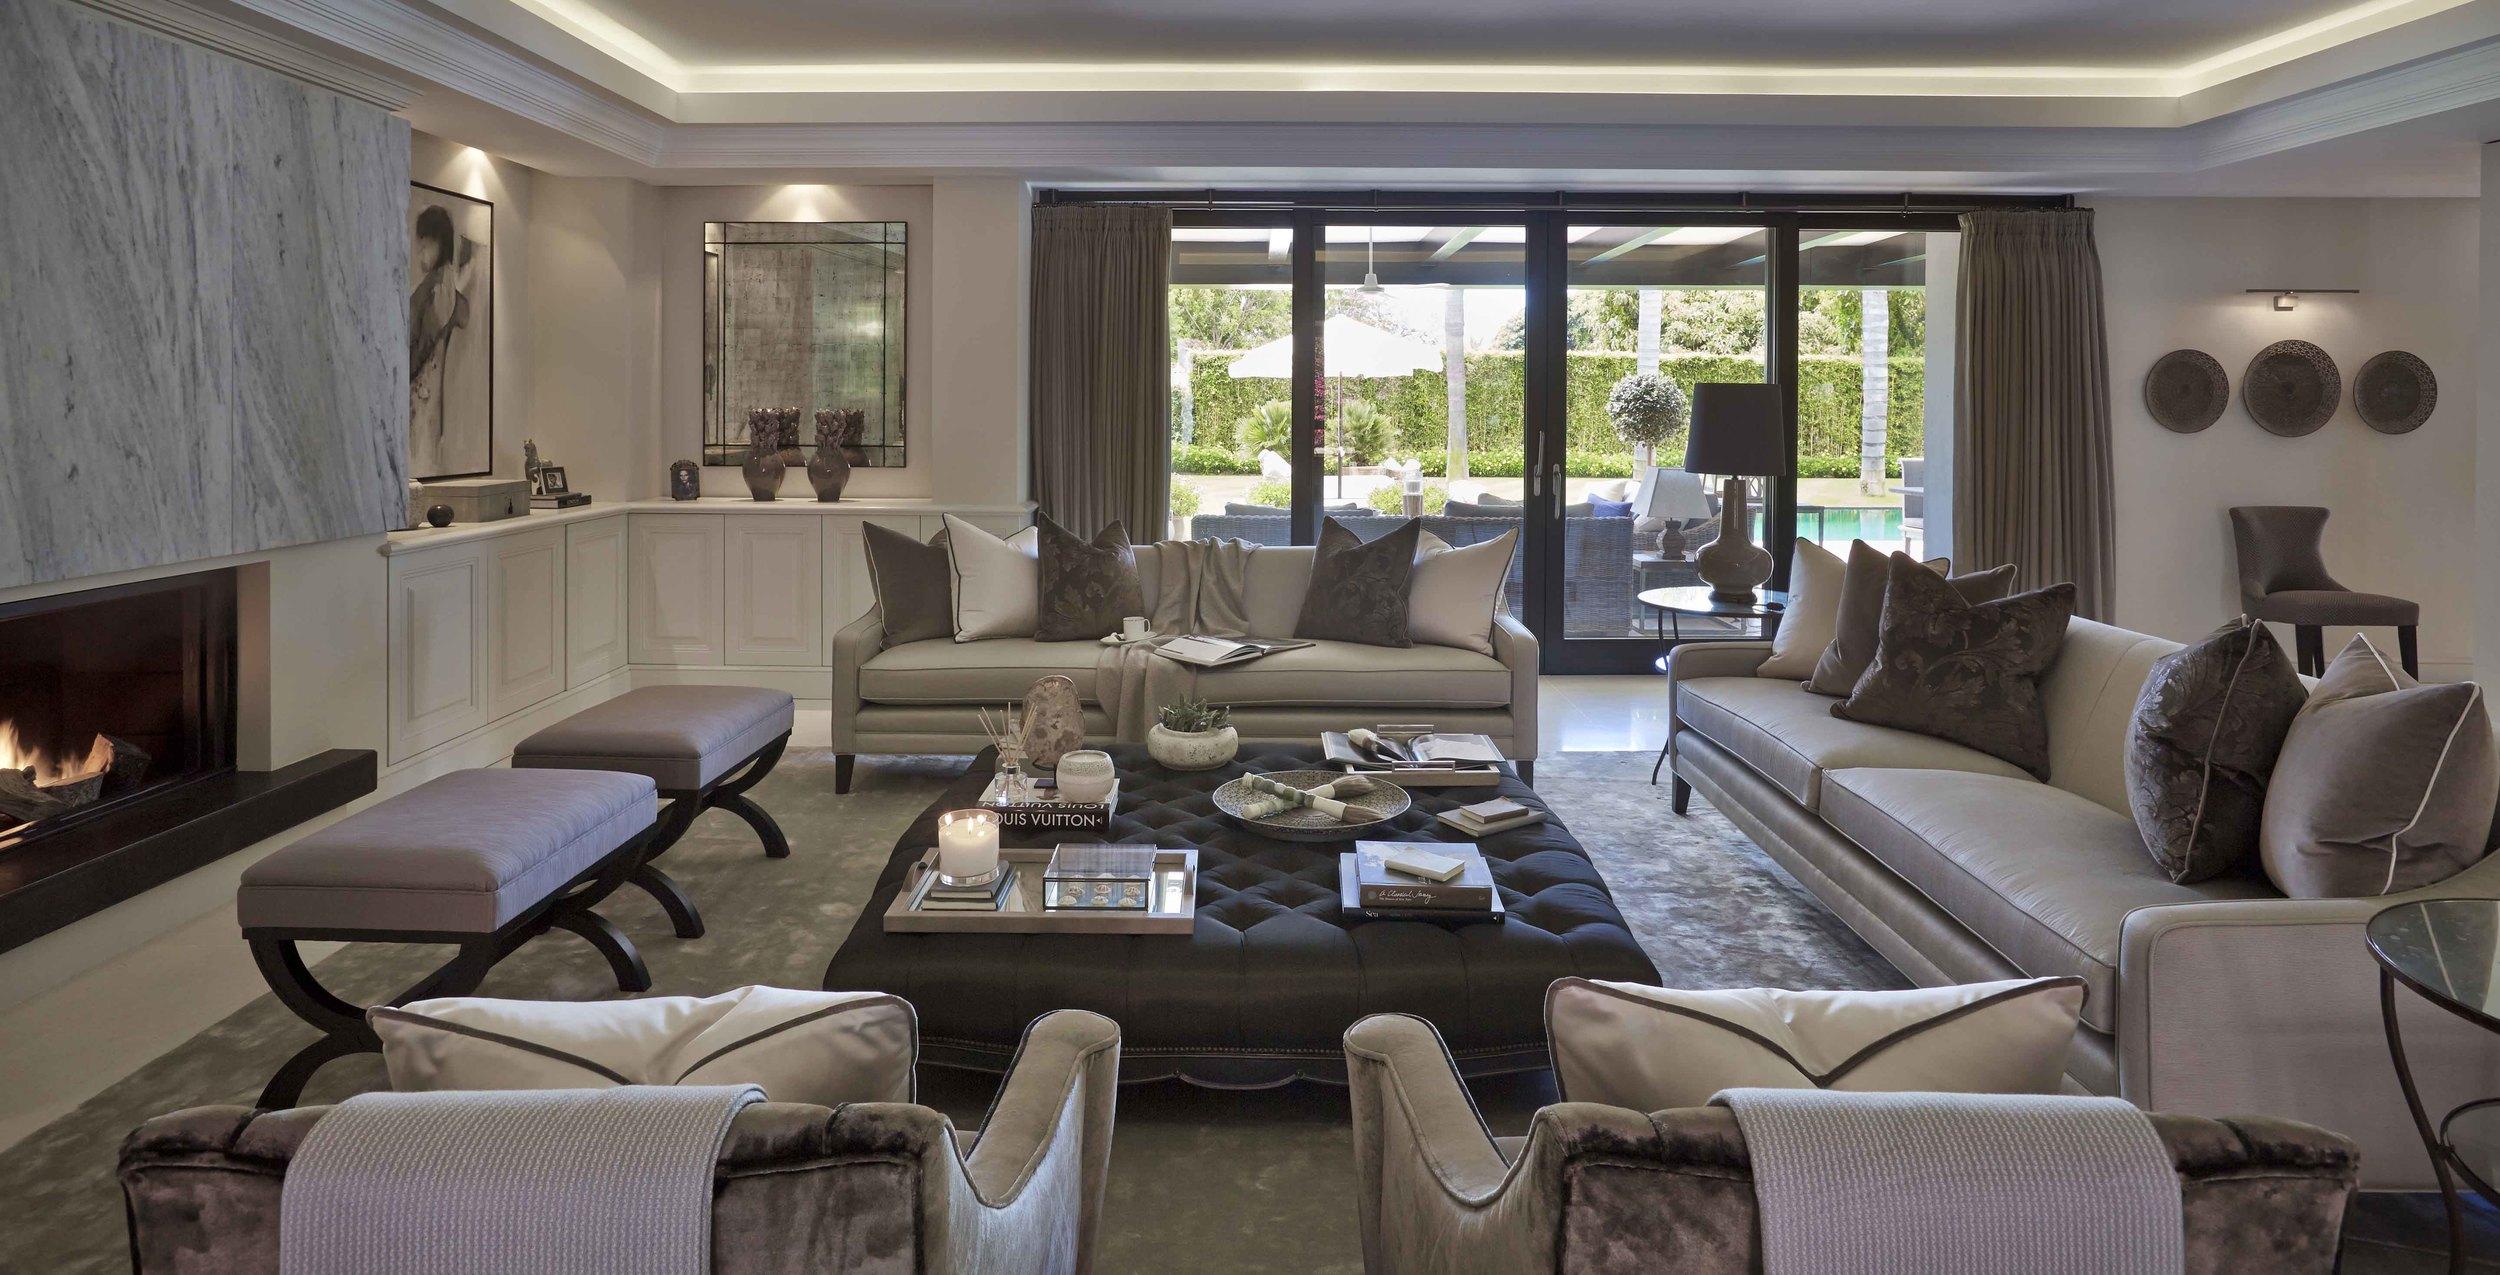 luxury interior design | london | surrey | sophie paterson